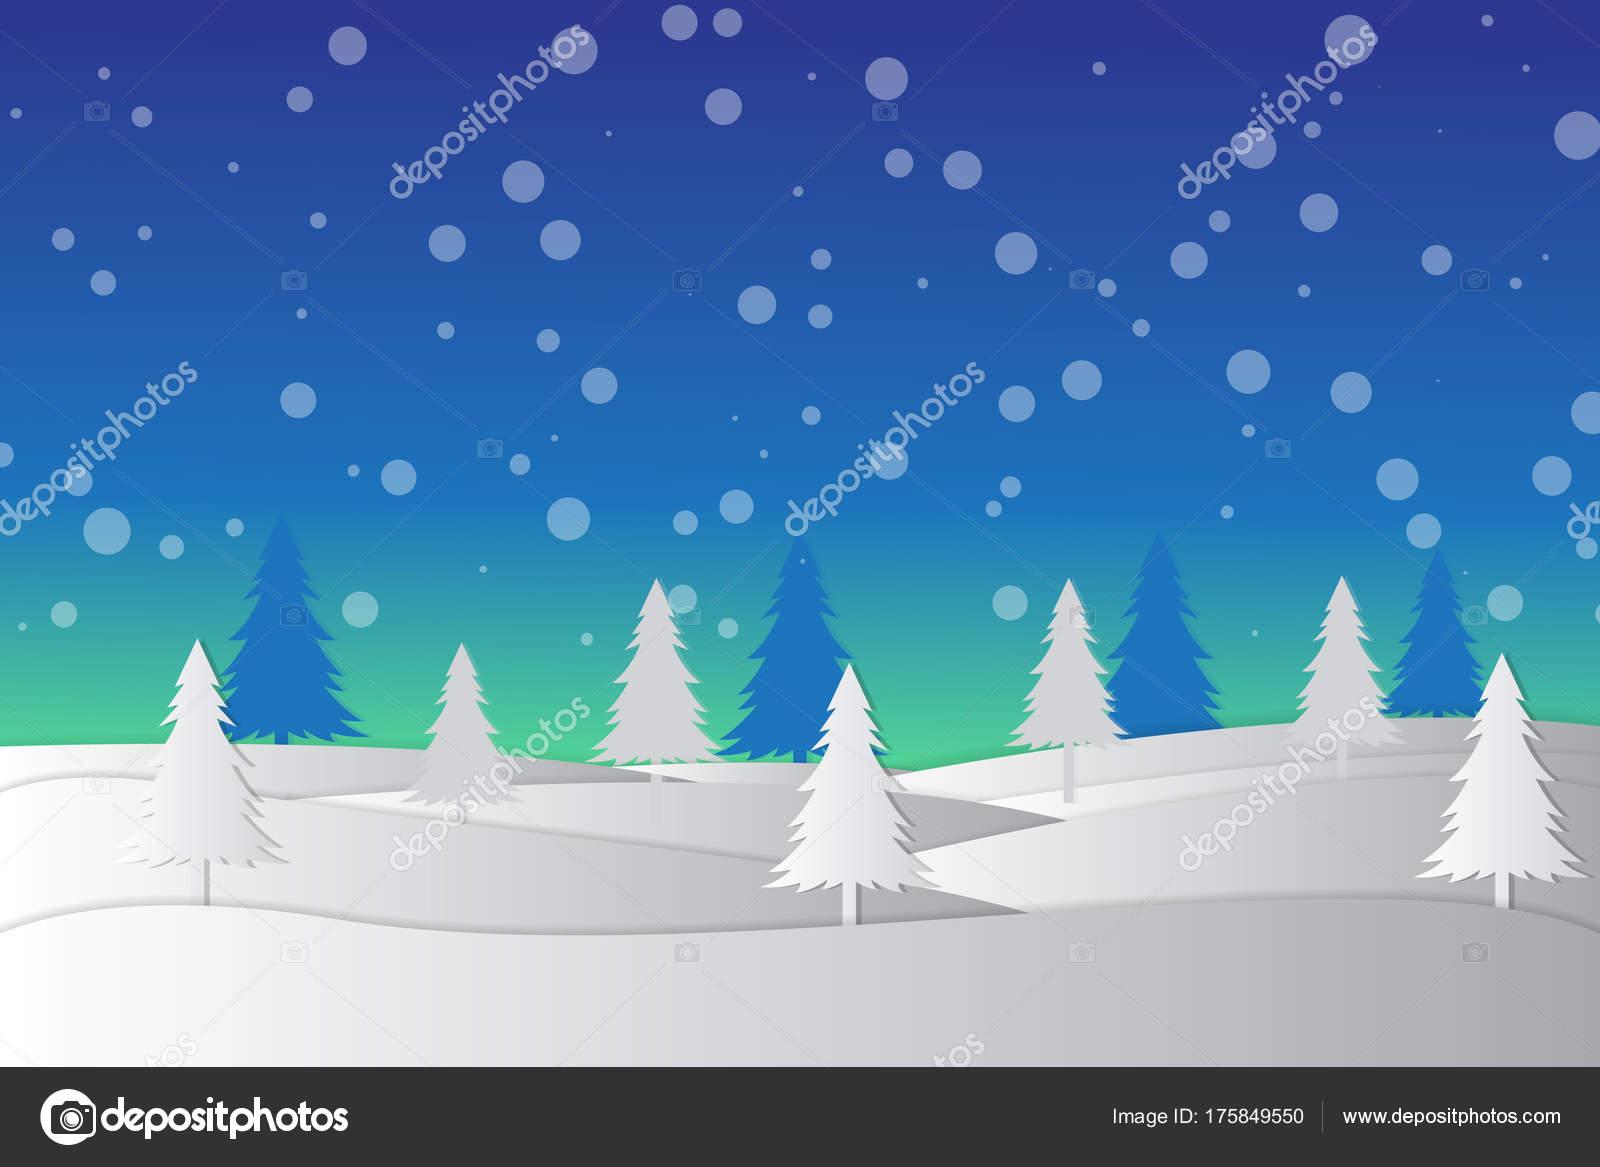 Sfondi Invernali Natalizi.Vettore Sfondi Invernali Natale Sfondo Paesaggio Invernale Natale